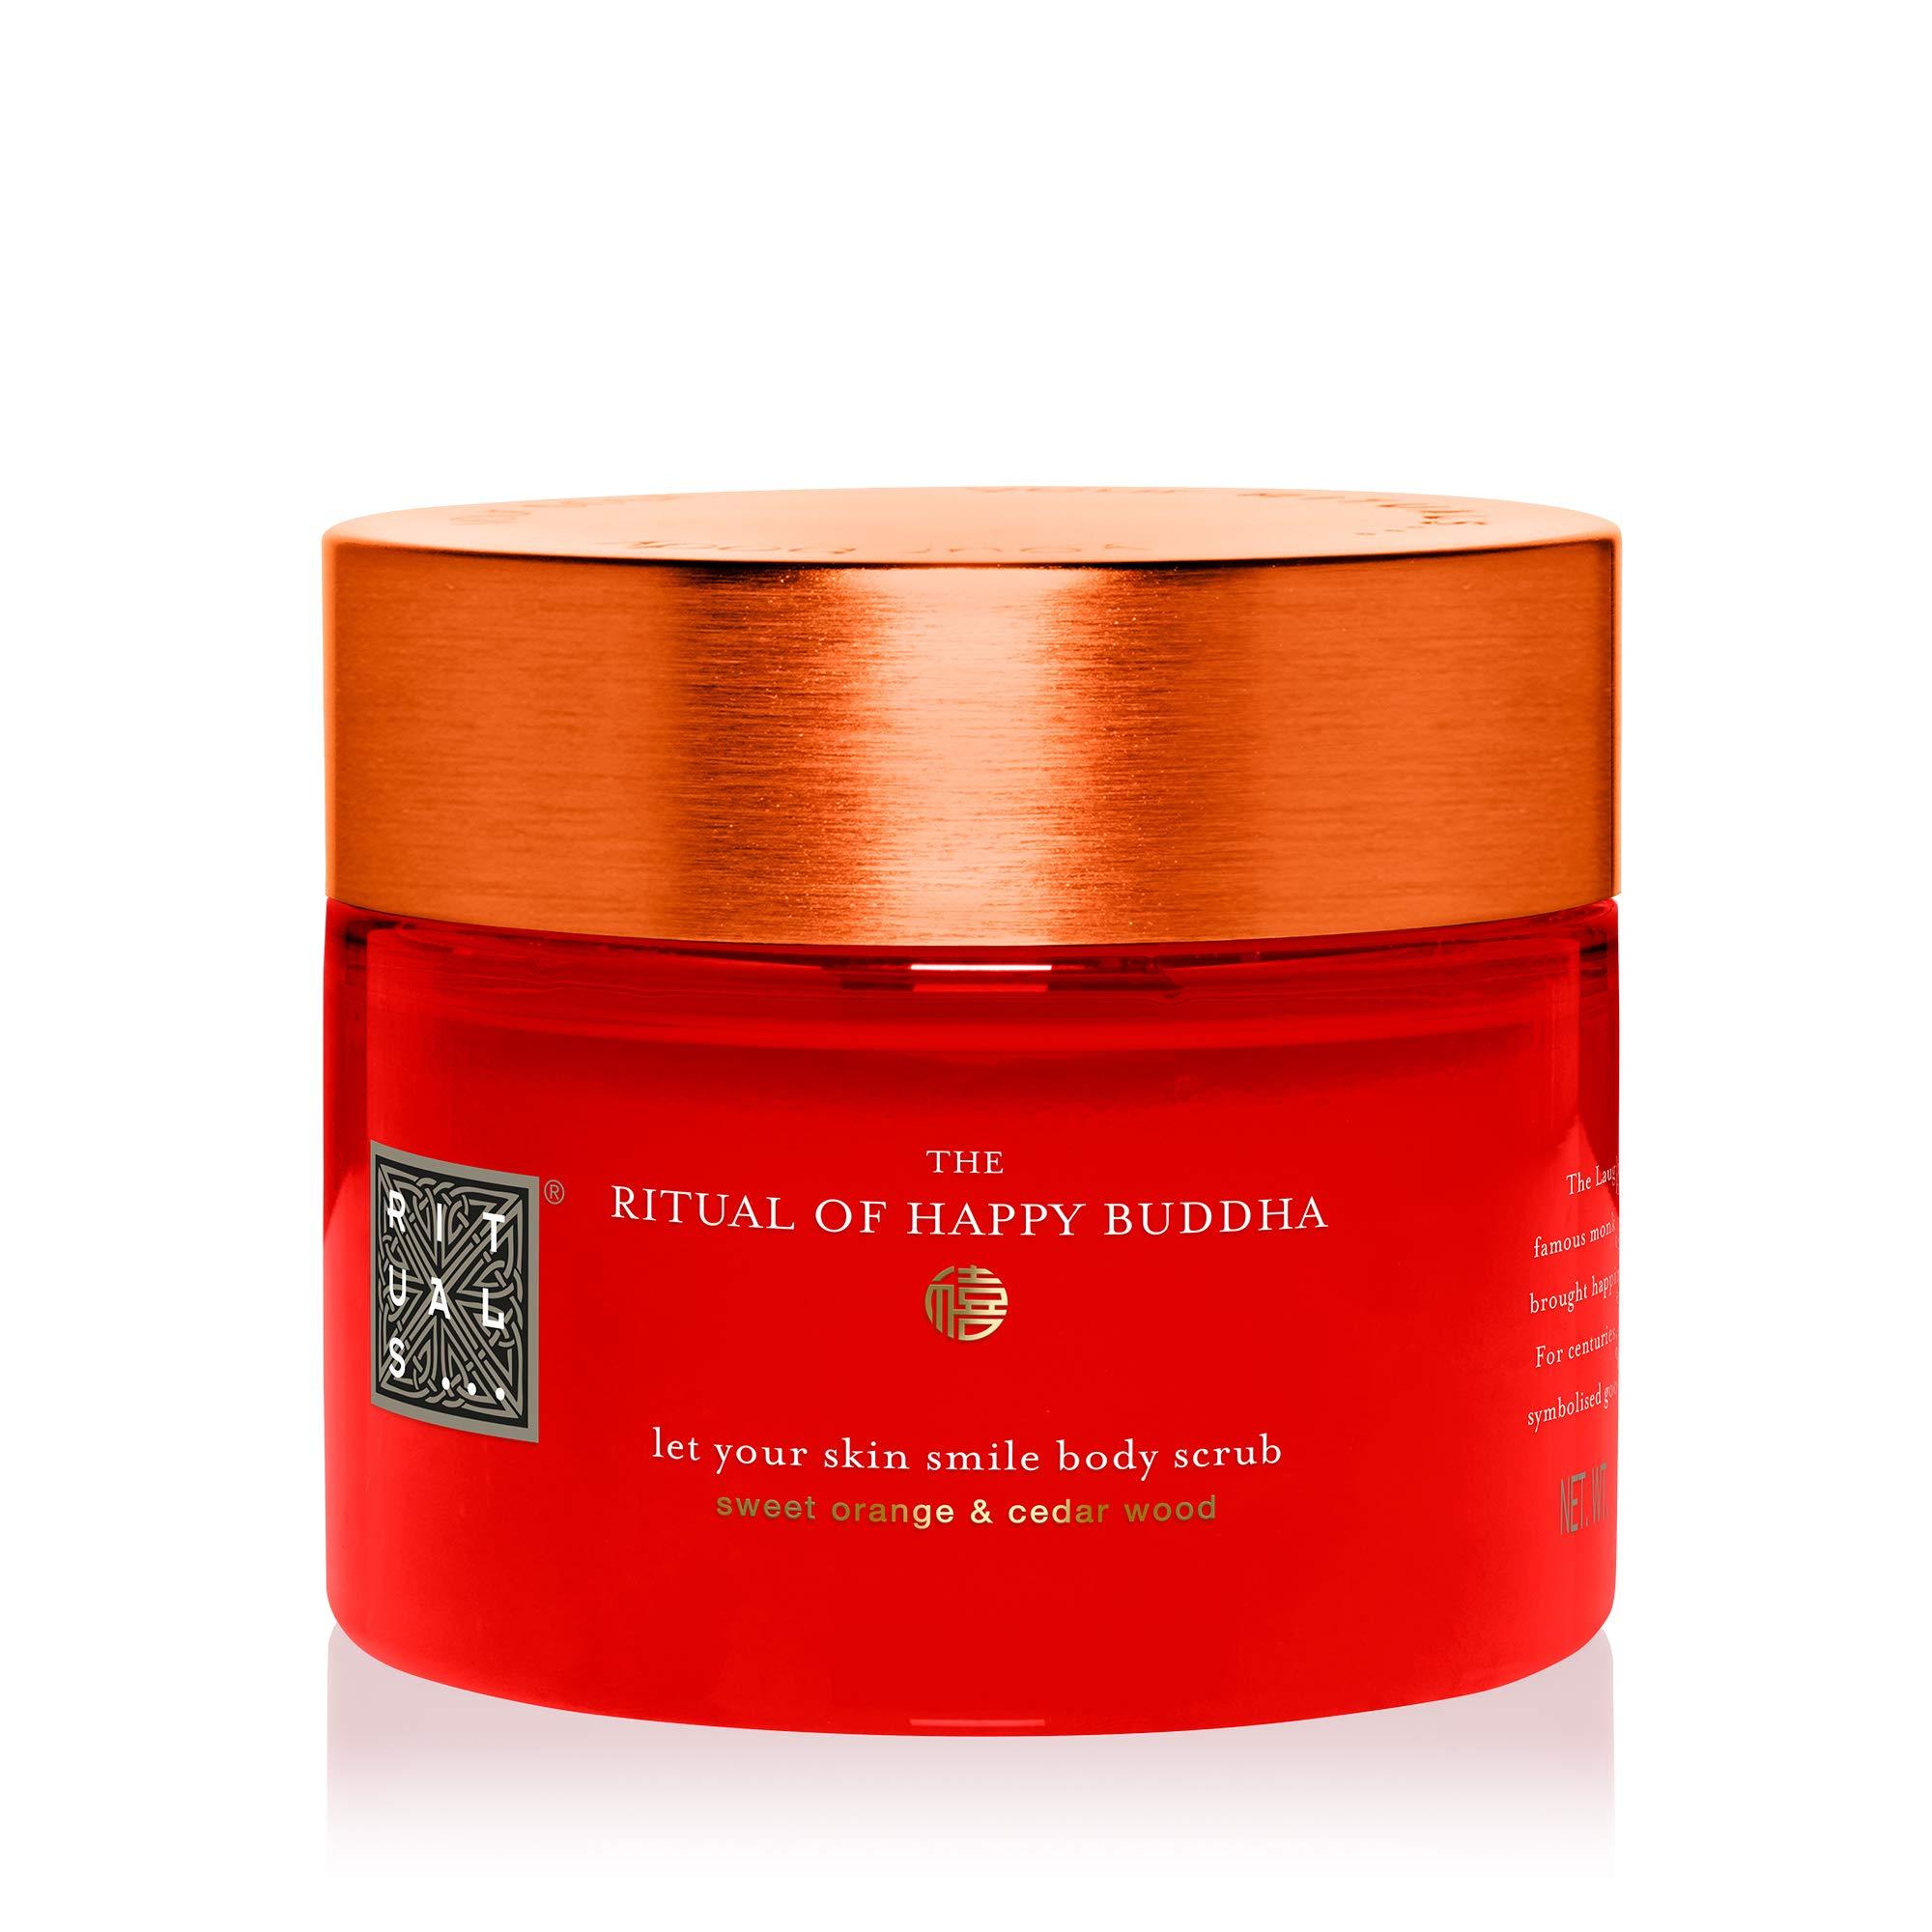 RITUALS The Rituals of Happy Buddha Body Scrub, 13.2 Oz by RITUALS